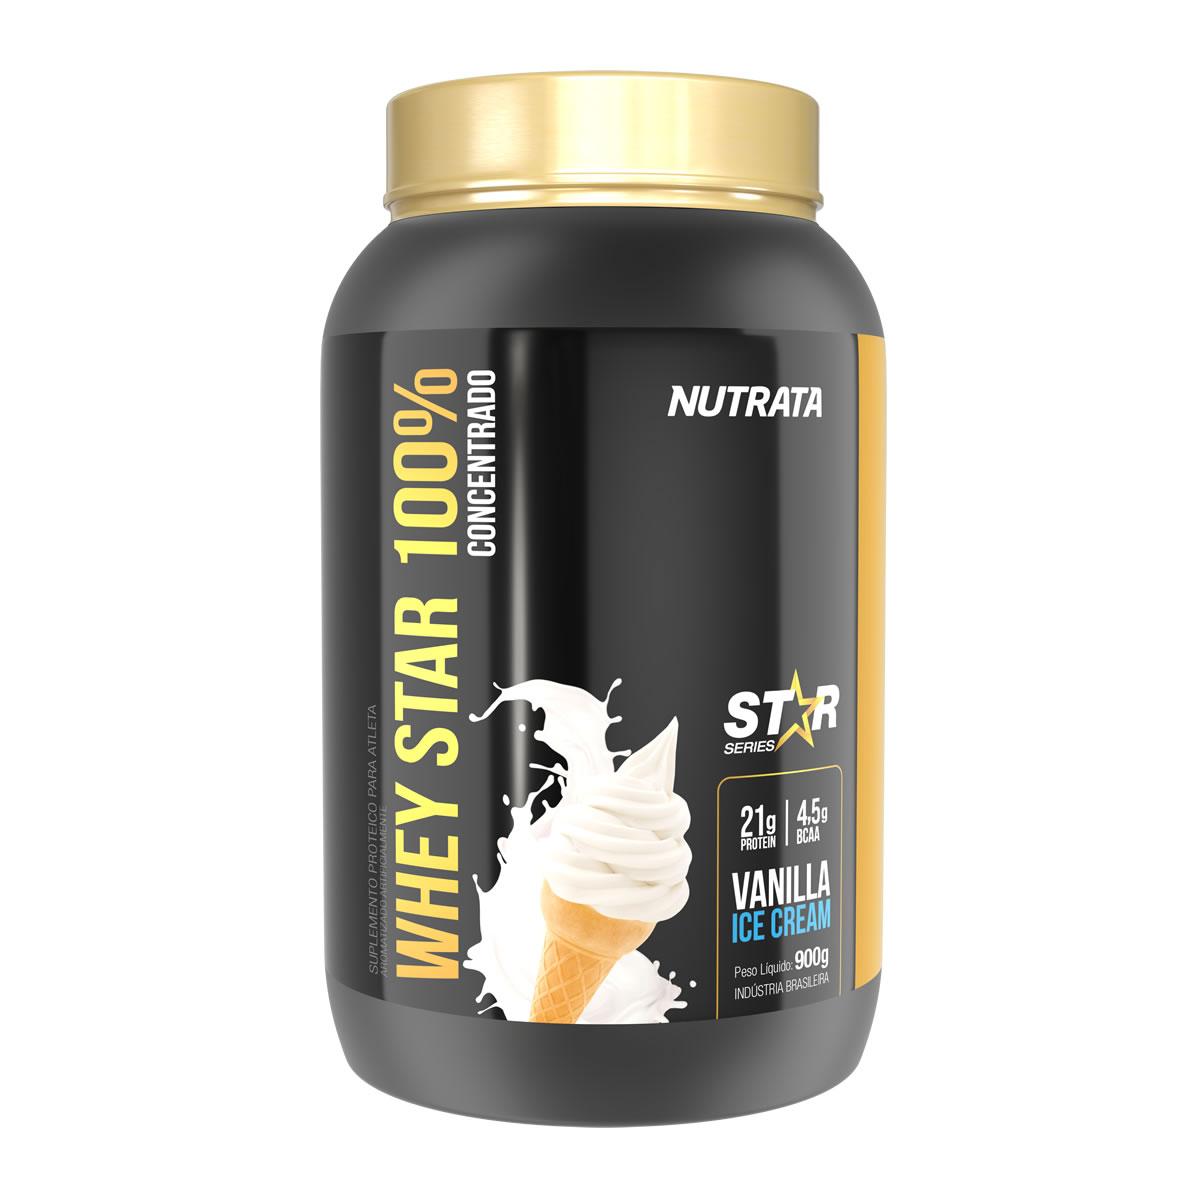 Whey Star 100% sabor Vanilla Ice Cream 900g - Nutrata